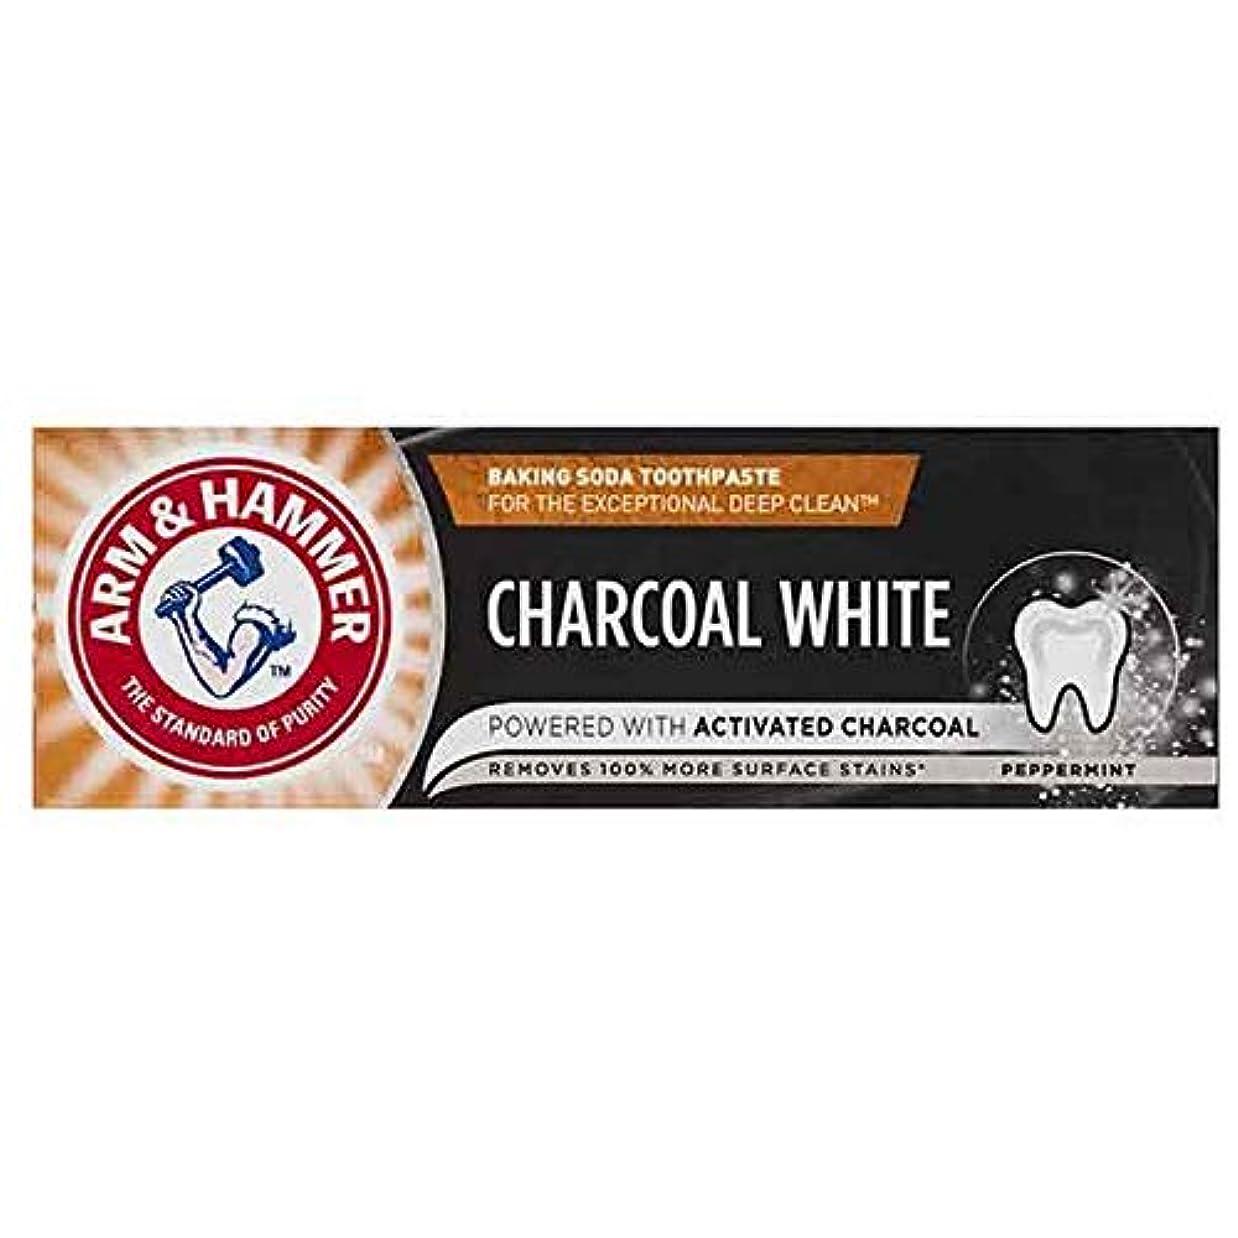 [Arm & Hammer ] アーム&ハンマー炭白い歯磨き粉25ミリリットル - Arm & Hammer Charcoal White Toothpaste 25ml [並行輸入品]